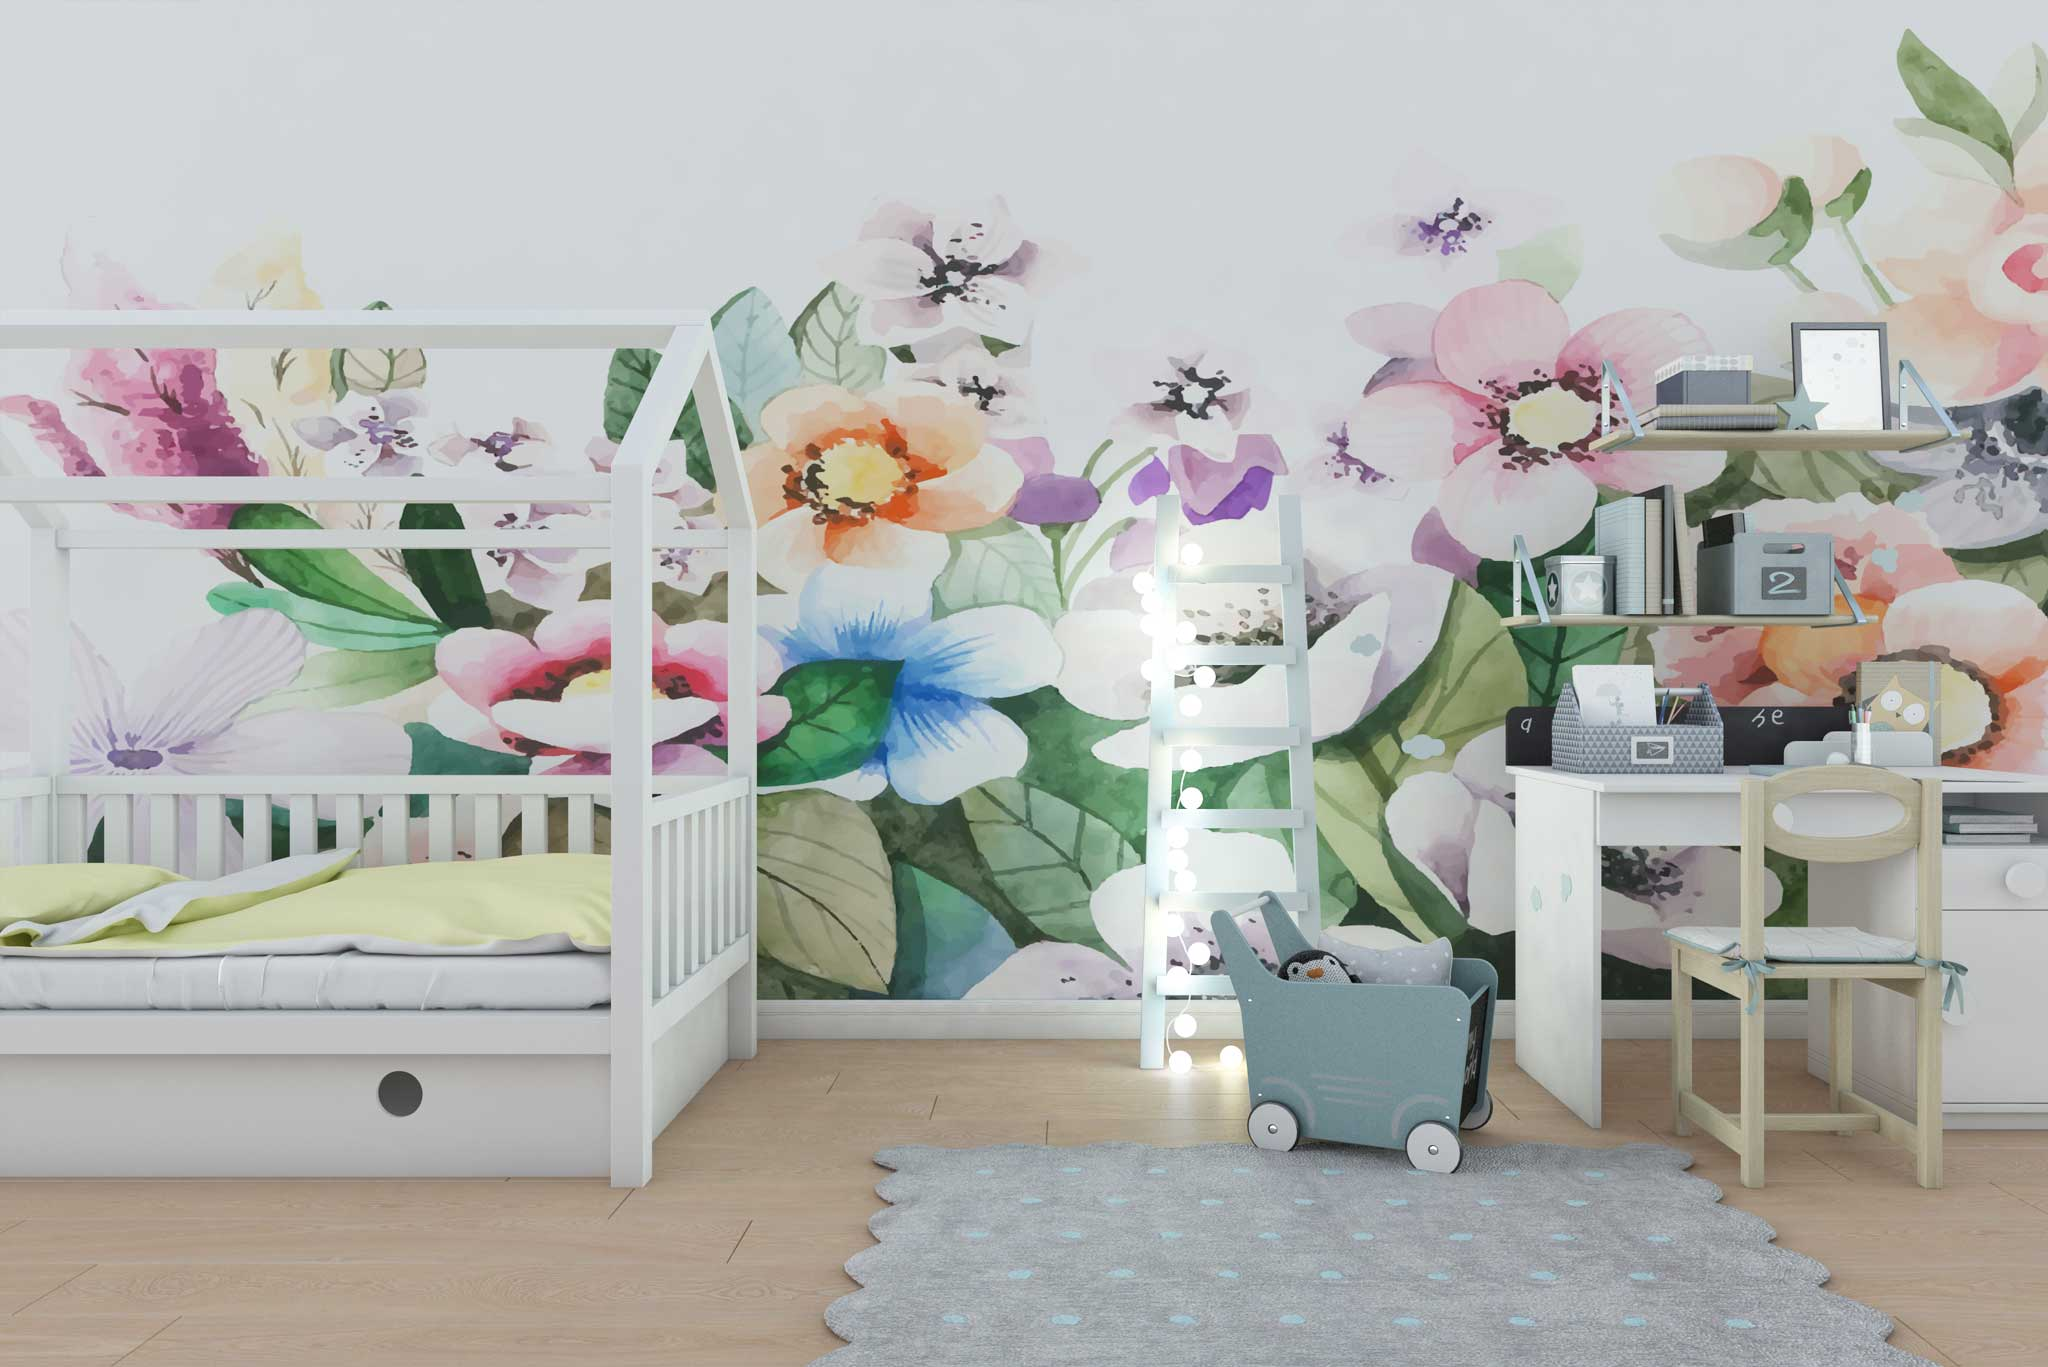 http://daringprints.ro/wp-content/uploads/2020/12/tapet-fototapet-design-personalizat-customizabil-comanda-special-camera-dormitor-copii-model-motiv-floral-flori-pictate-acuarela-fundal-alb-multicolor-pastel.jpg